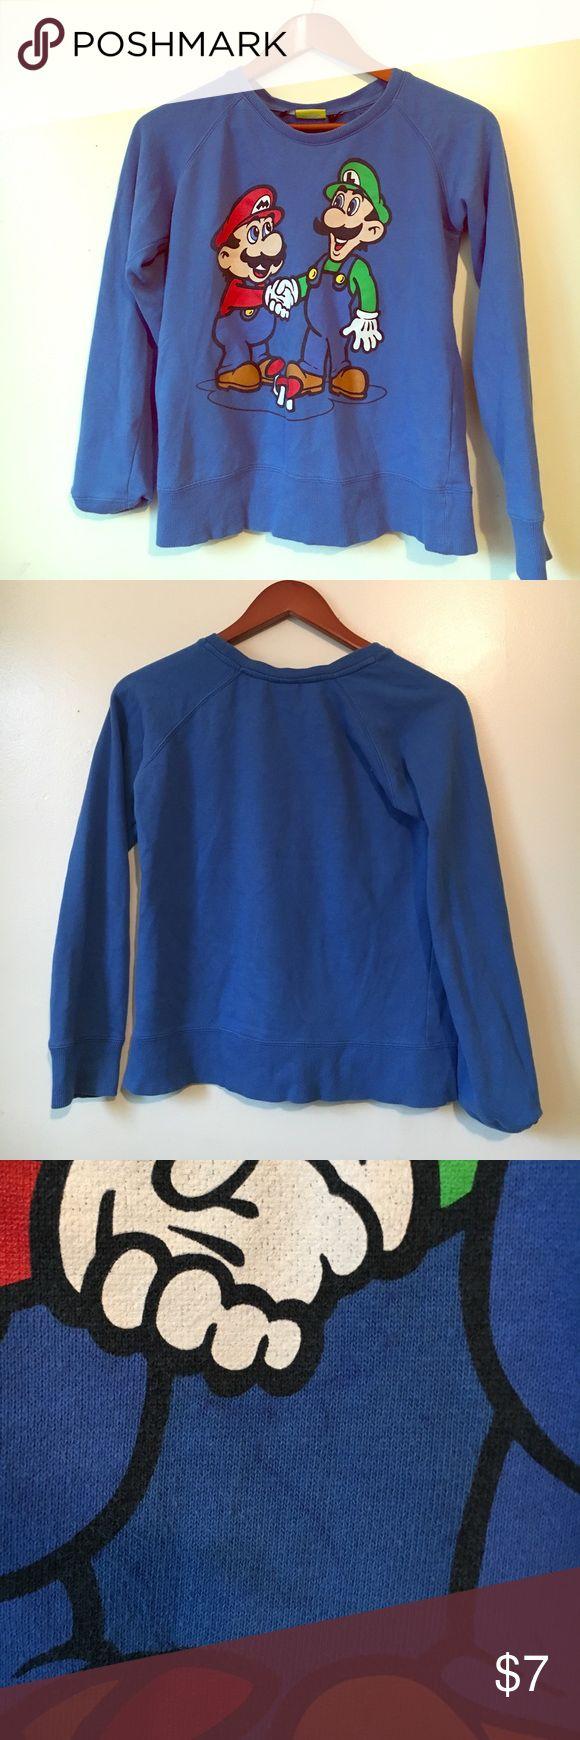 CLEARANCE SUPER MARIO BROS 3 SWEATSHIRT 🔥 Royal blue, Medium, Faint blue pen markings on bottom, A classic. Ok condition. Hot Topic Sweaters